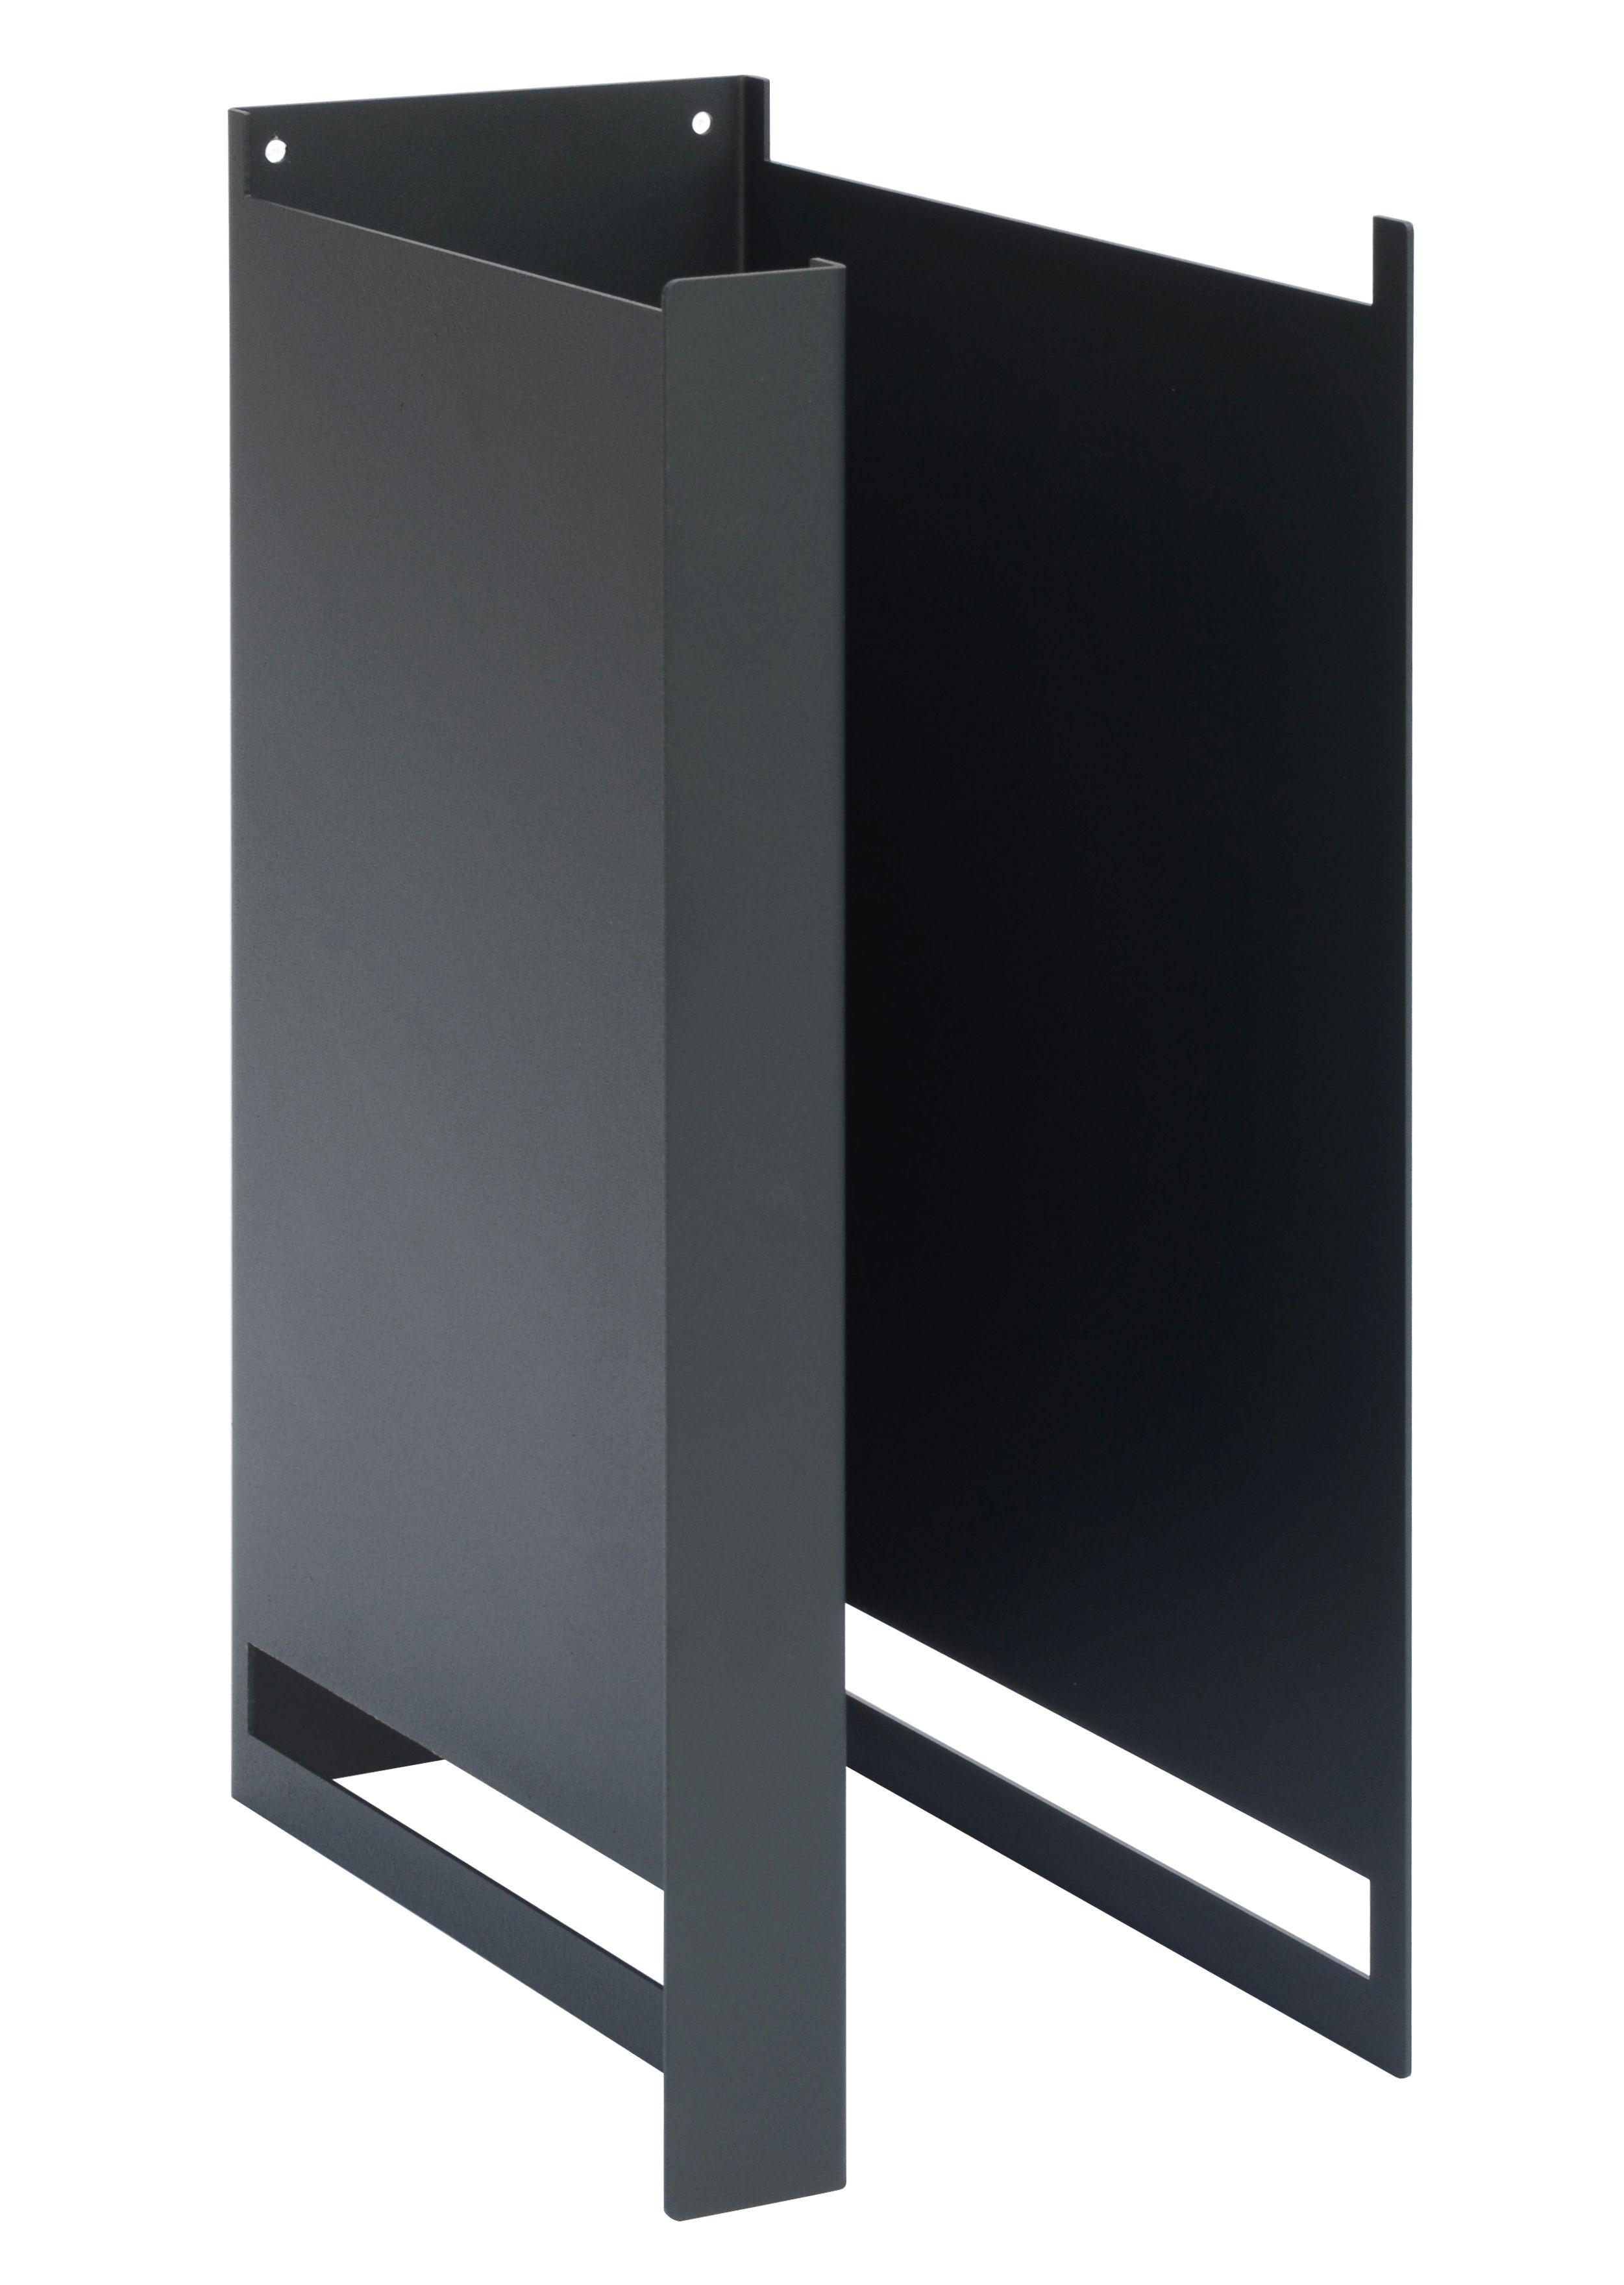 Plio Ho Caisson mural - Vertical module - H 39 cm Slate ...